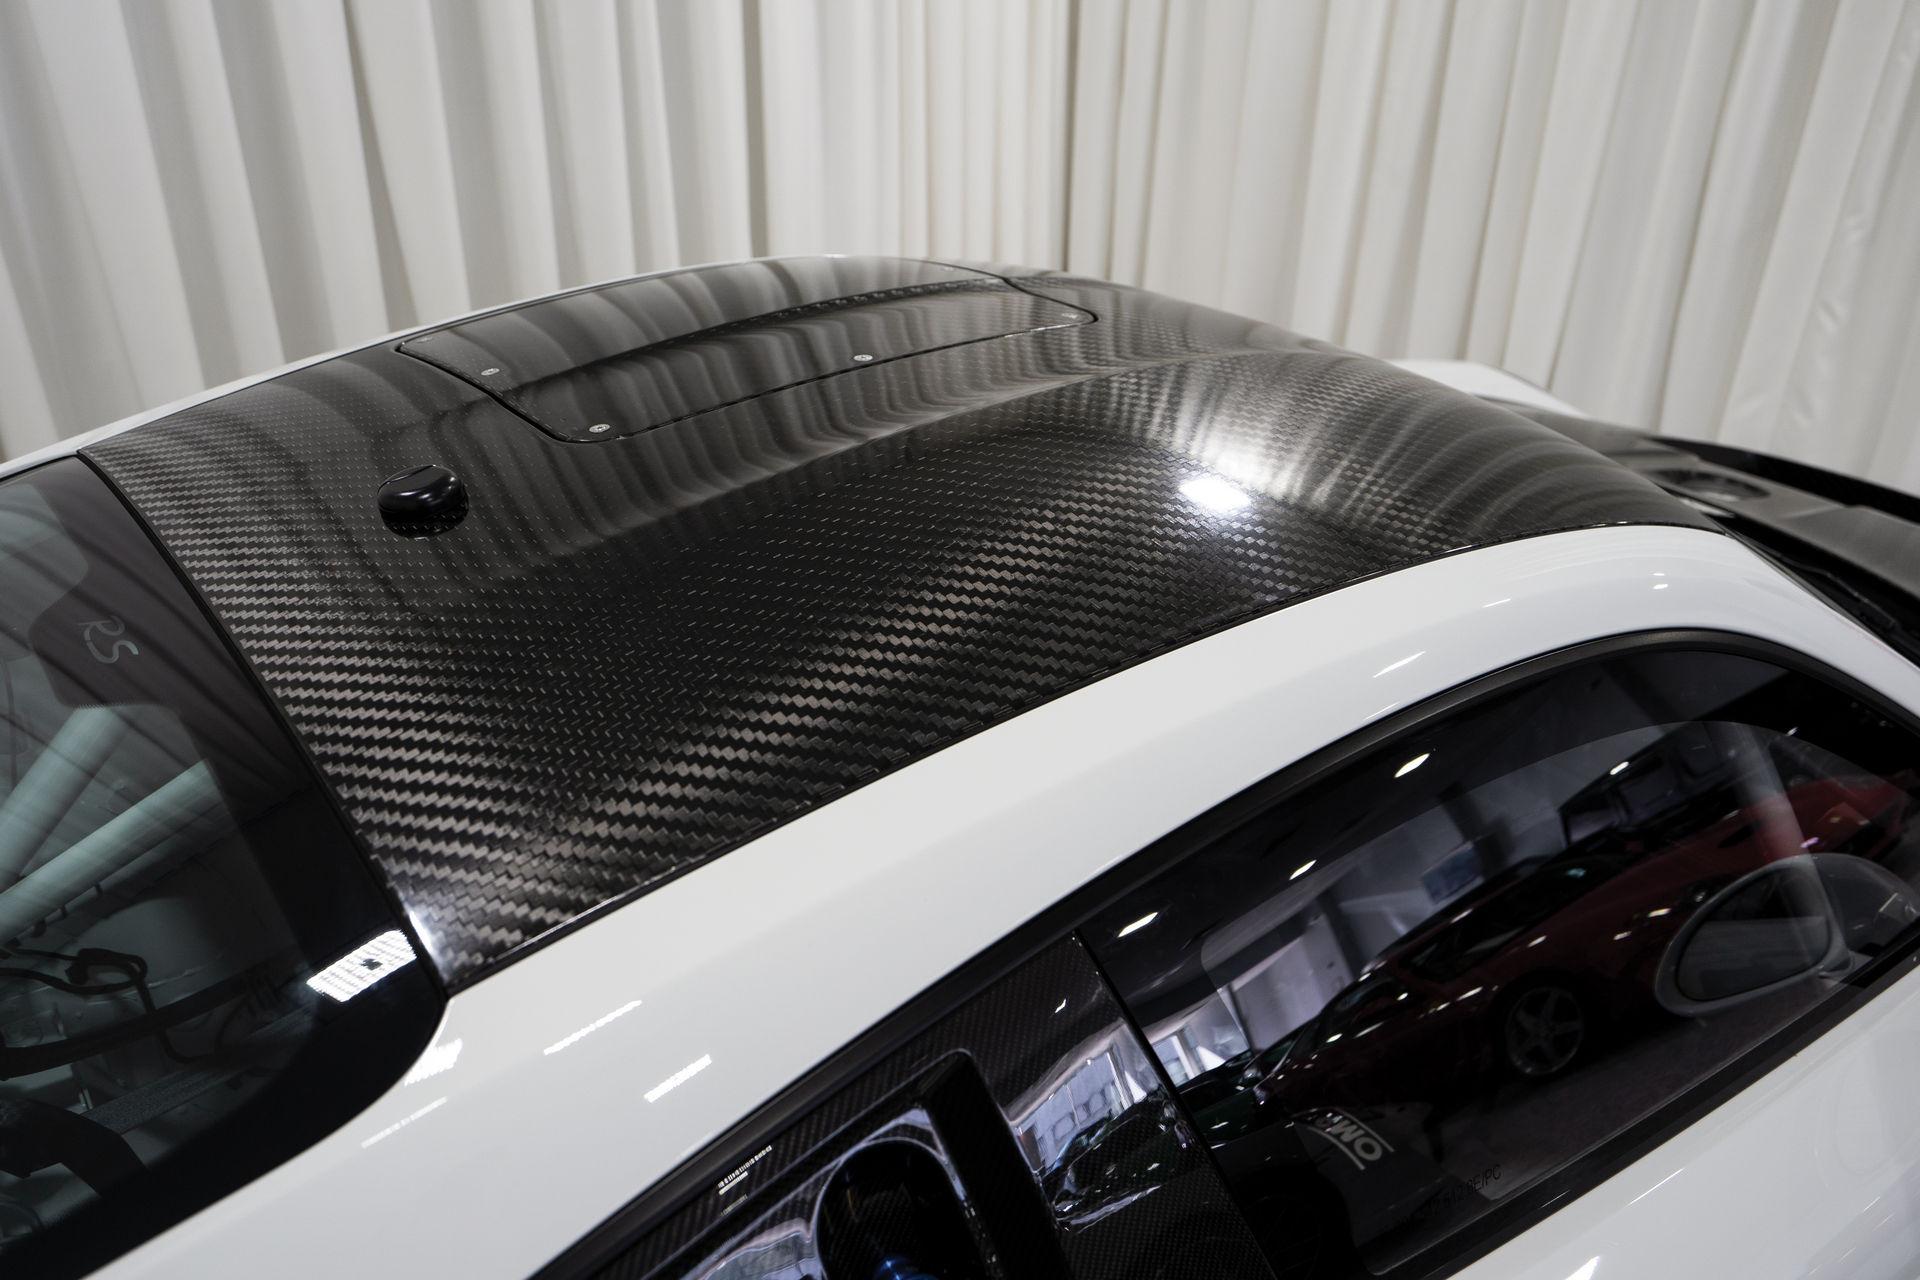 Porsche-911-GT2-RS-Clubsport-auction-26